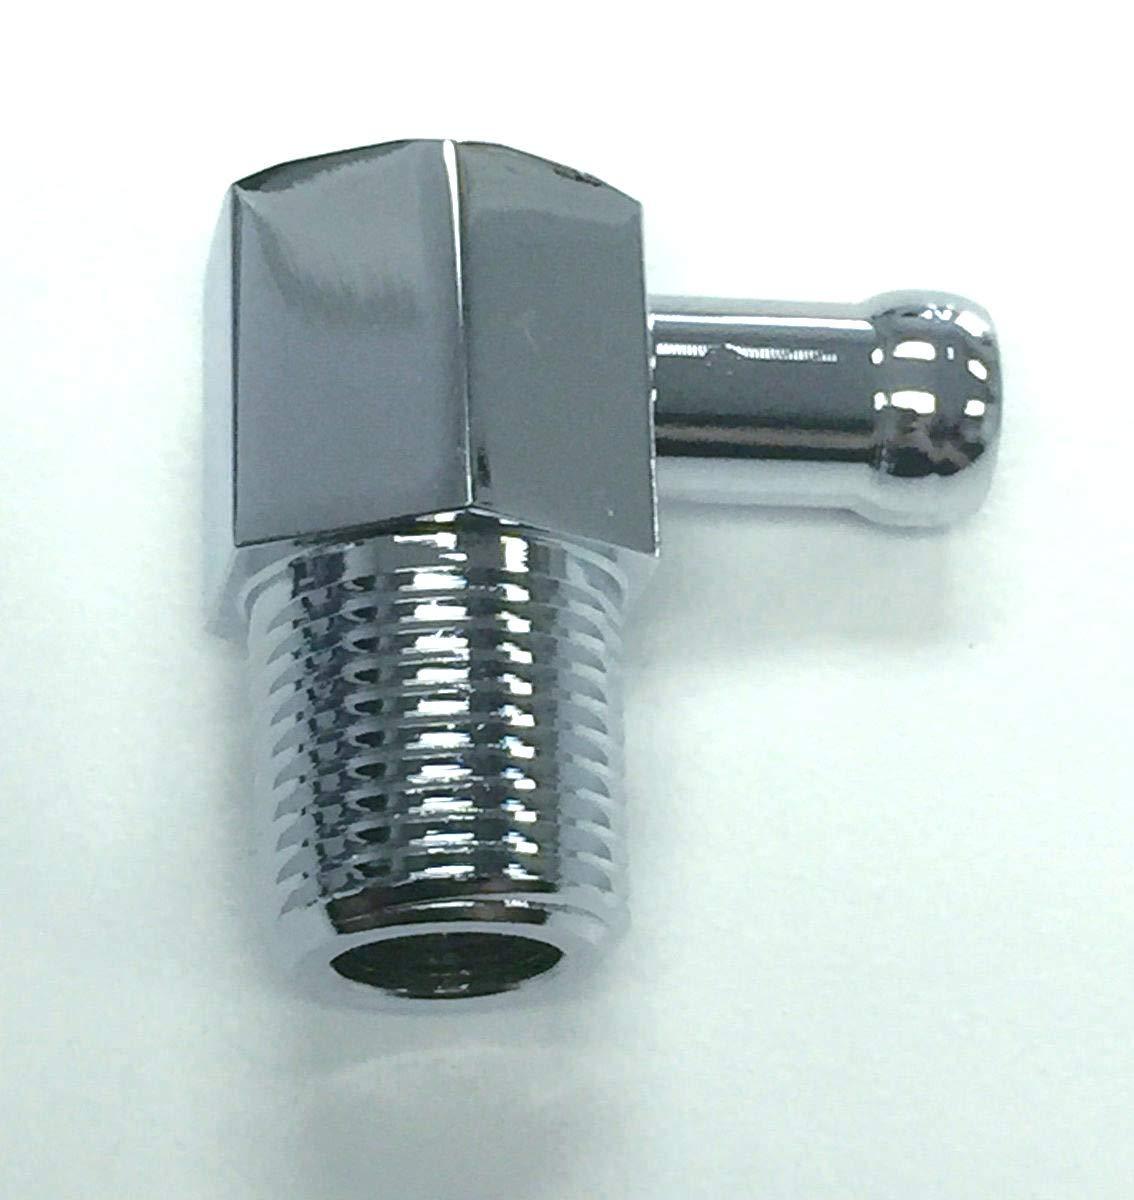 "Pirate Mfg Hot Rod Chrome Aluminum 90 Degree Intake Vacuum Fitting 3/8"" NPT & Hose"